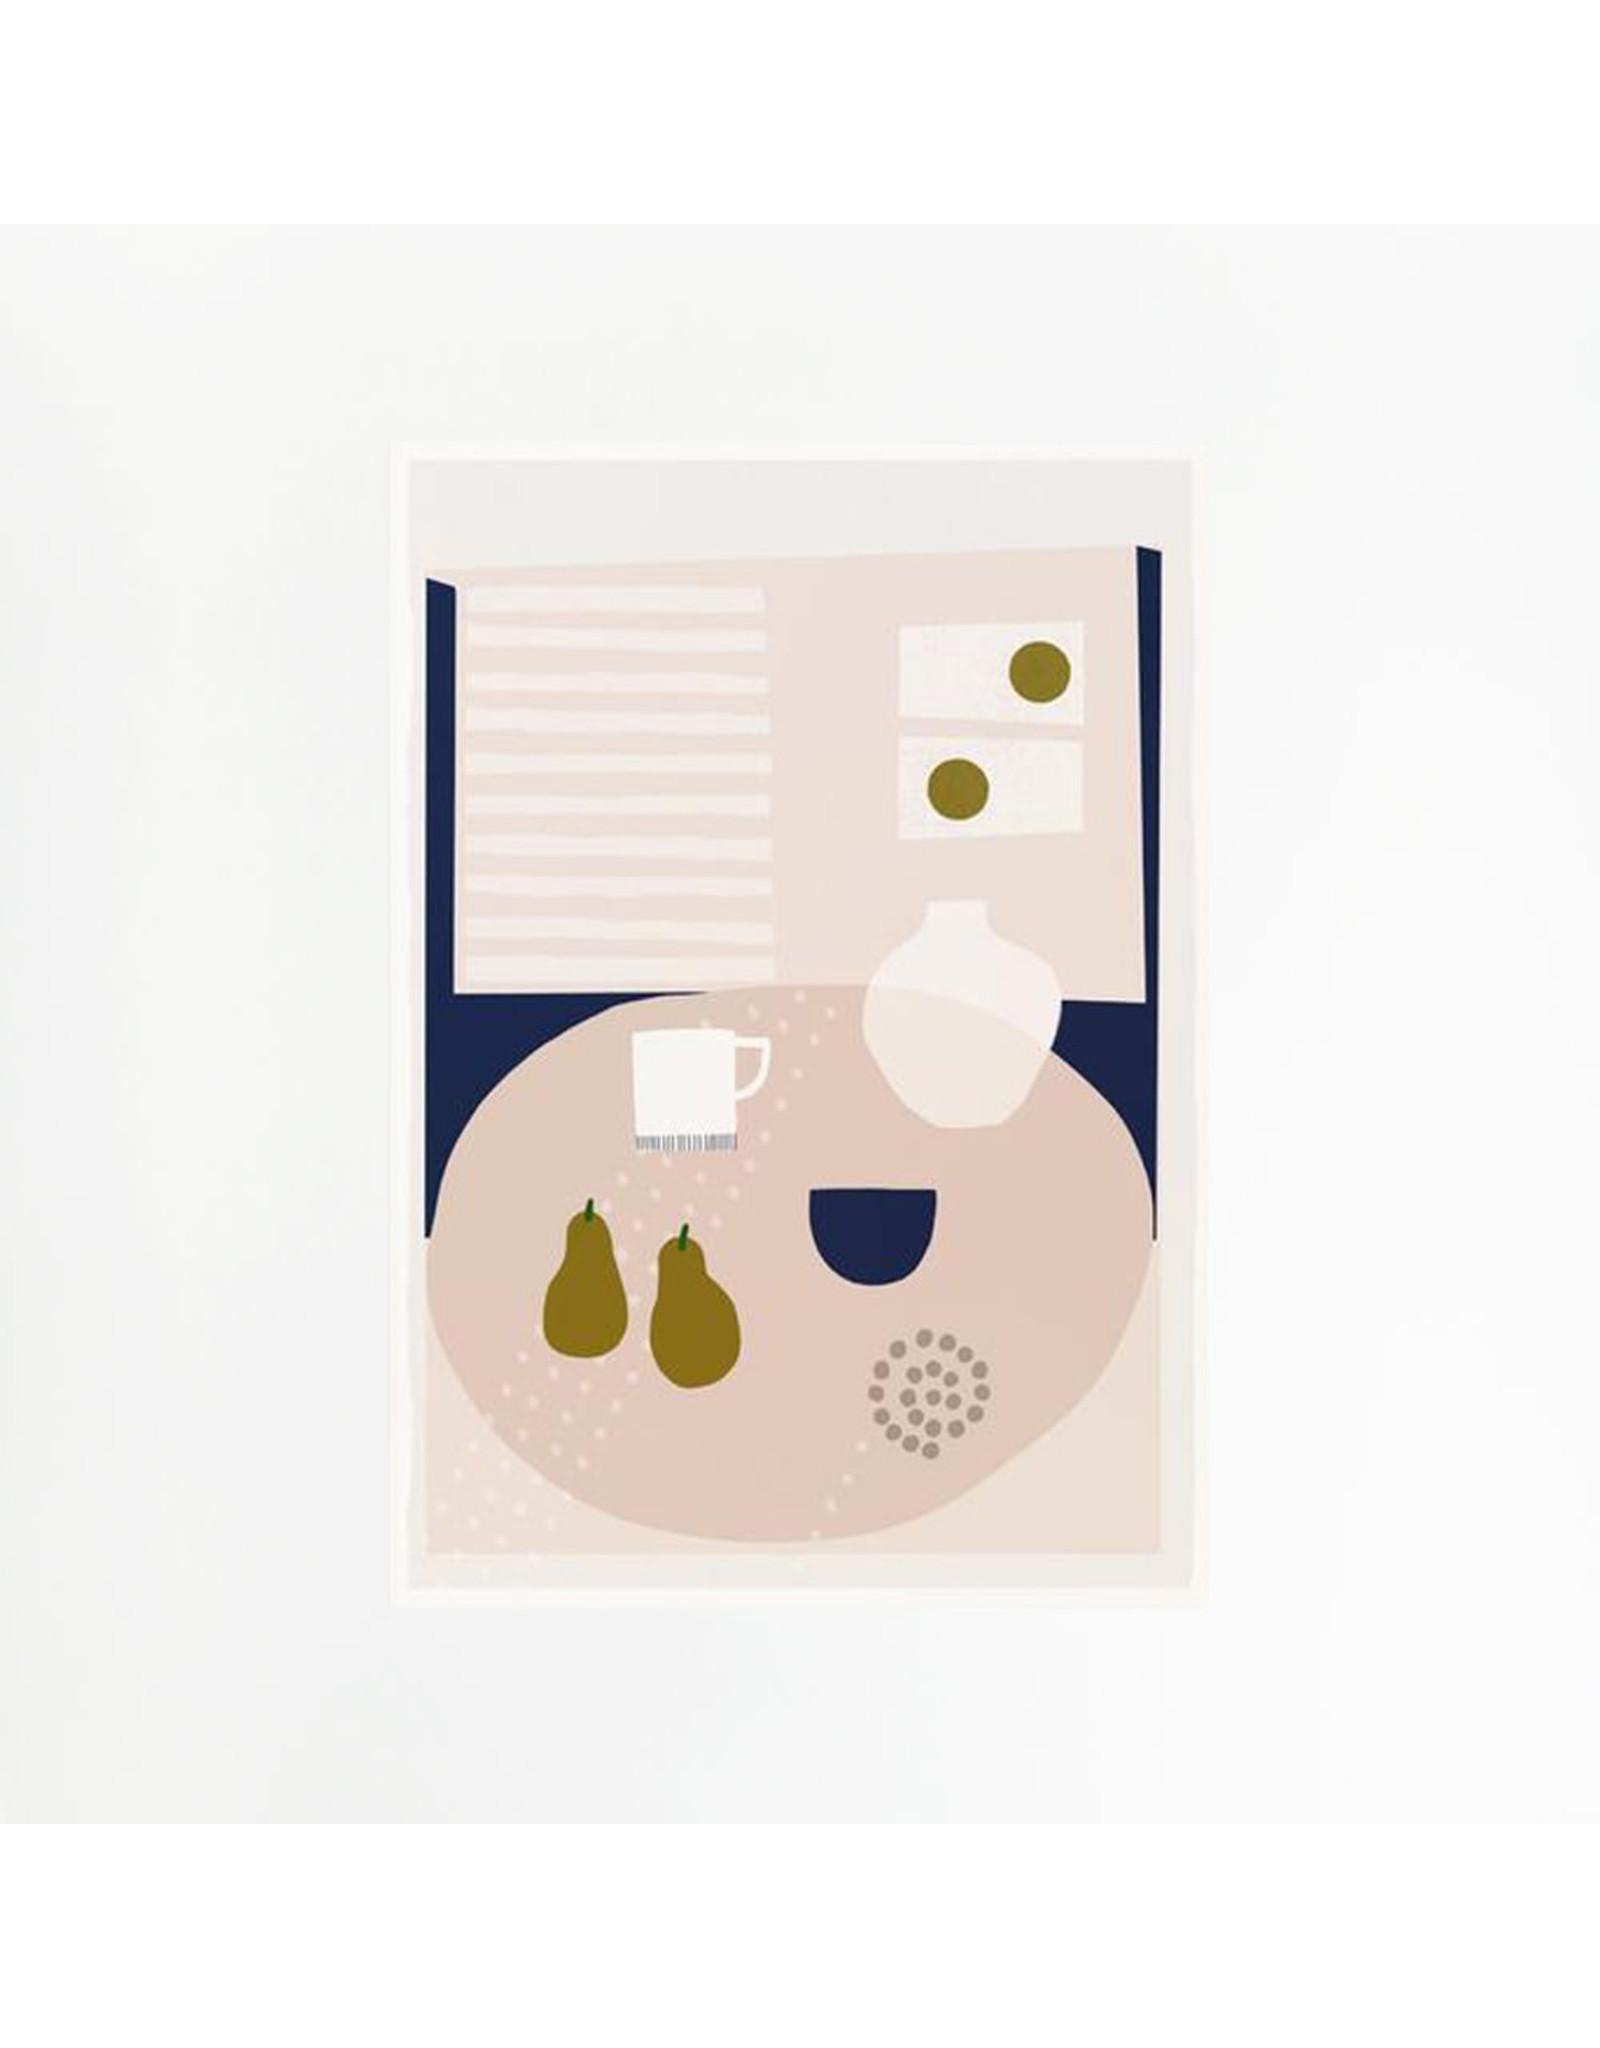 Kettles Yard Pears A4 Print